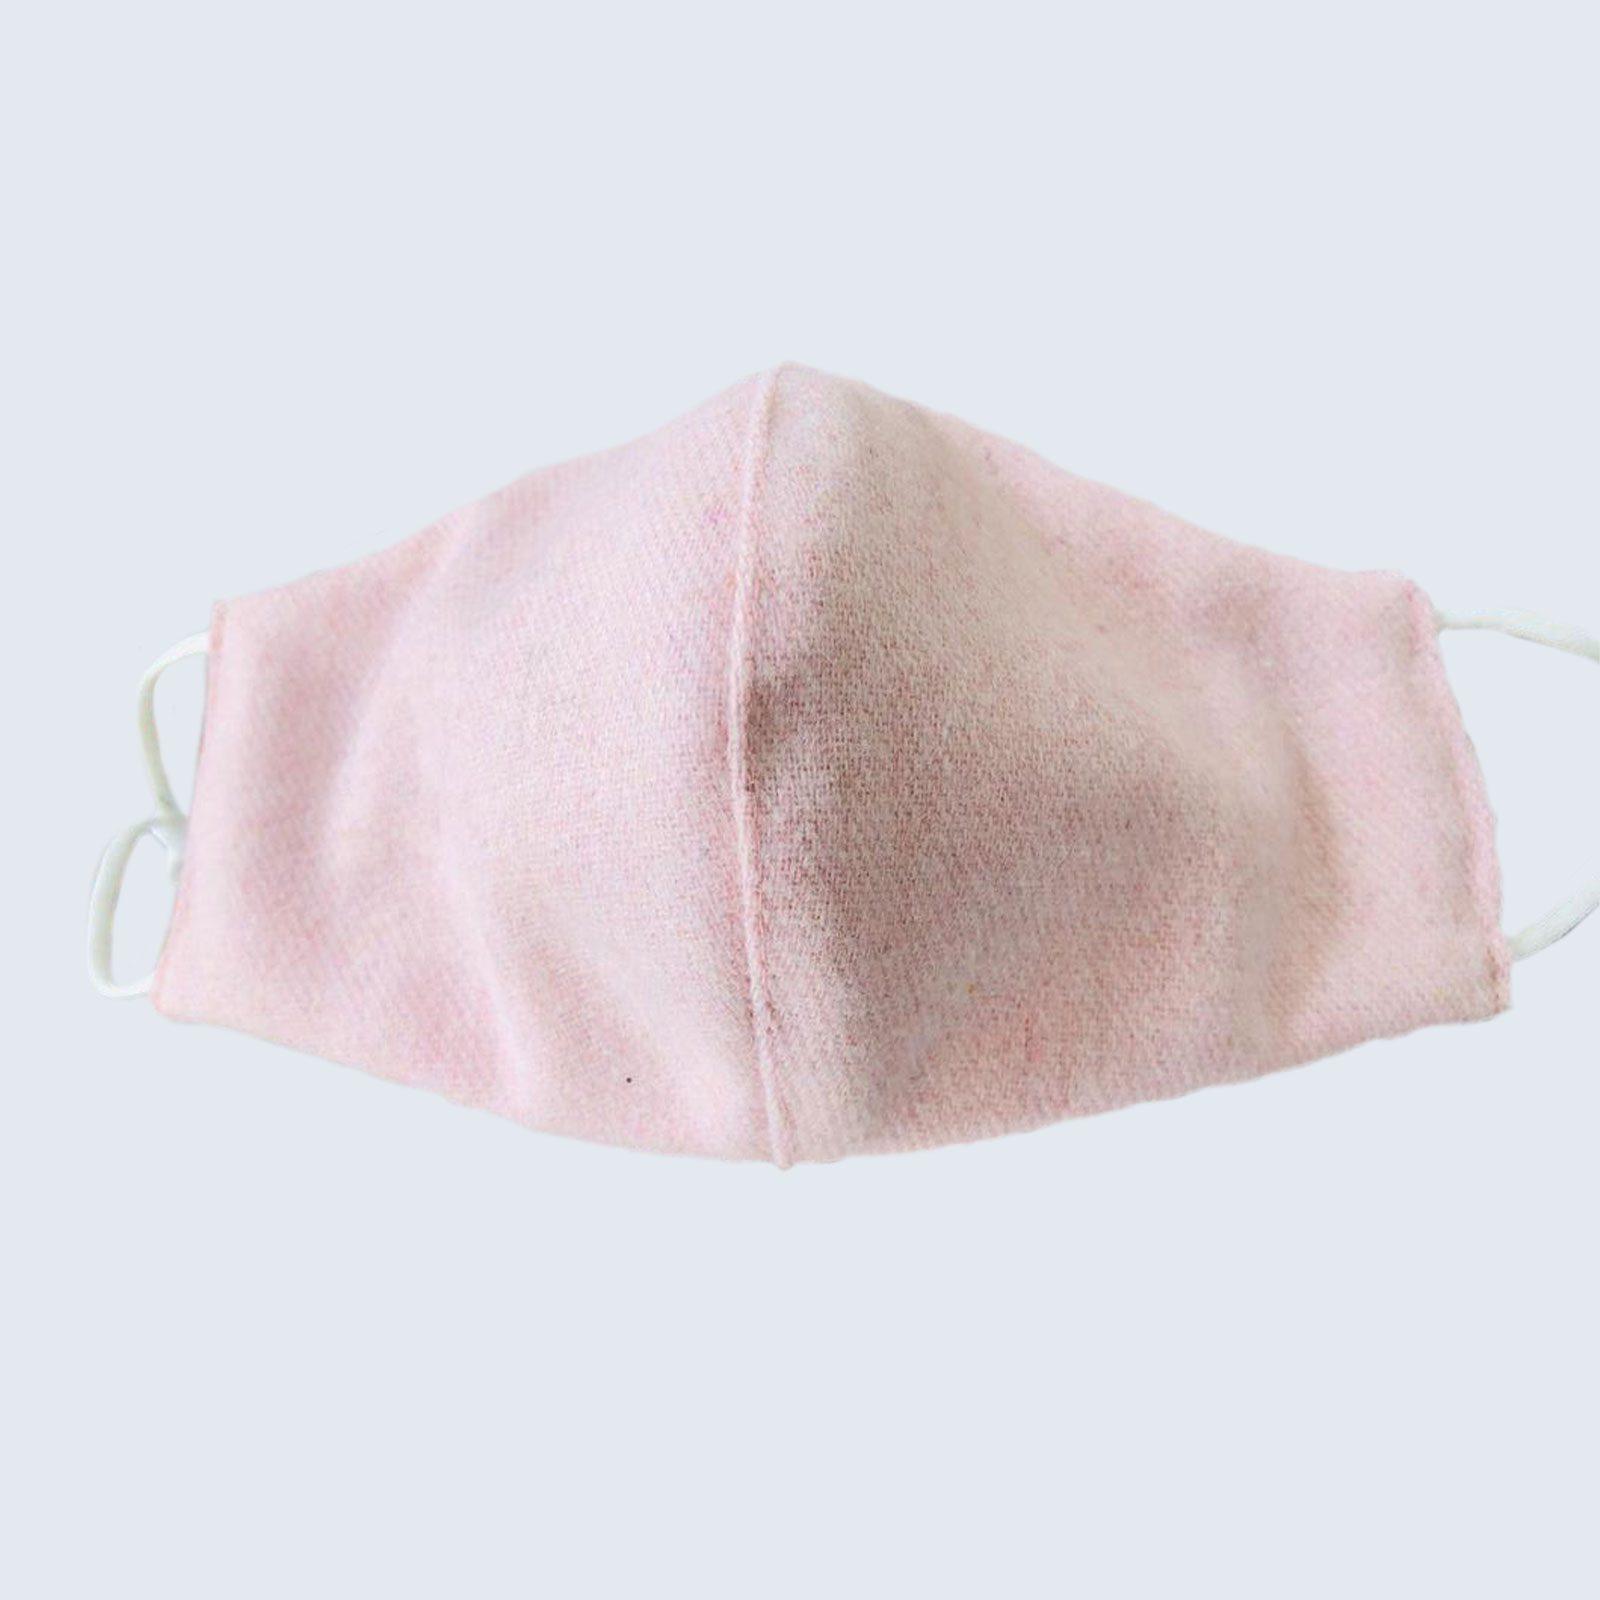 PhiladelphiaMade Merino Wool Face Mask